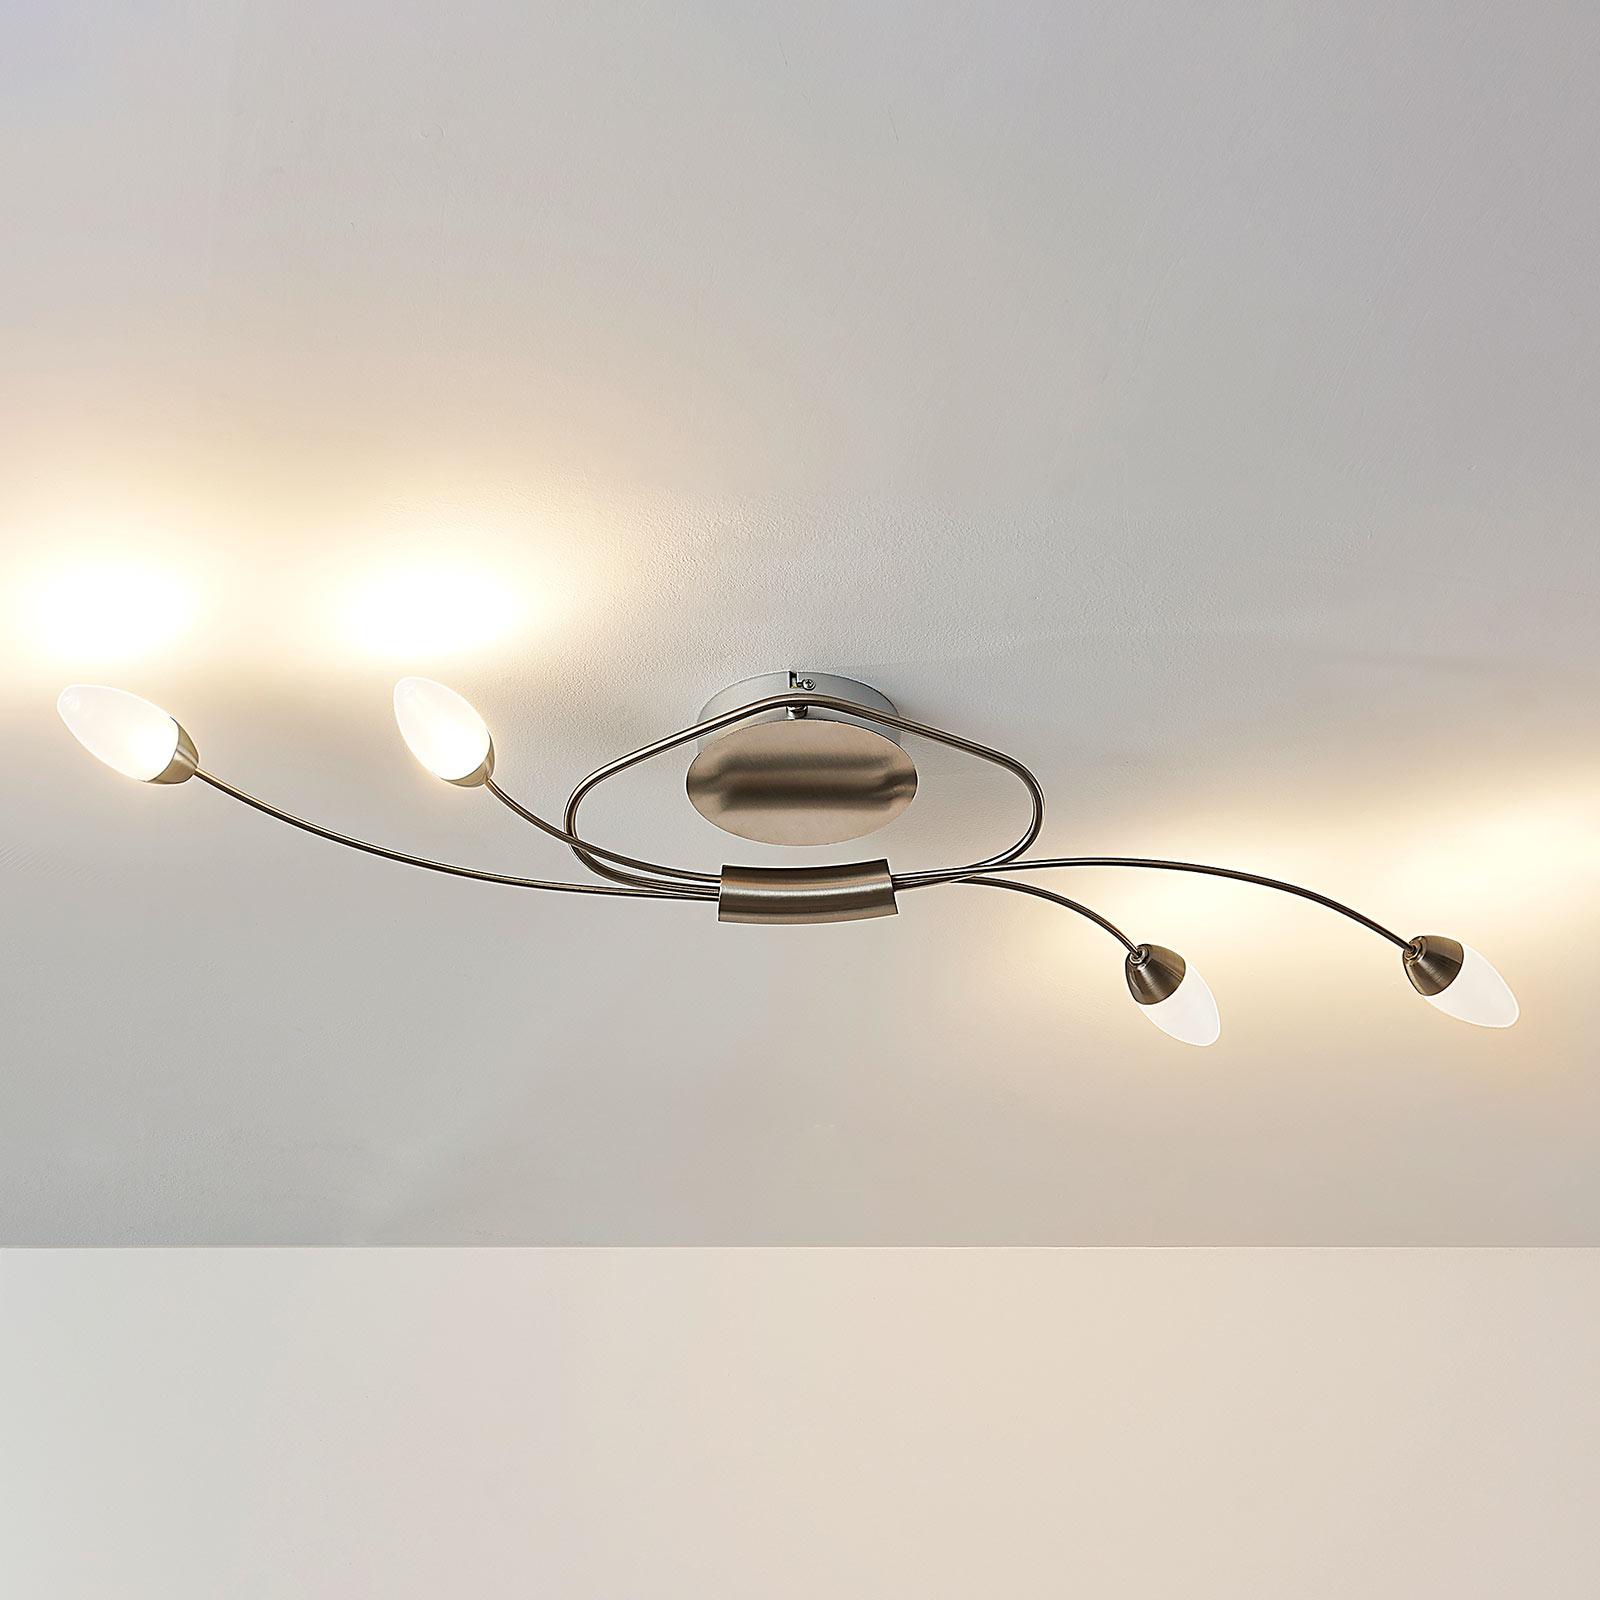 Acquista Plafoniera LED Deyan a 4 luci, dimmerabile